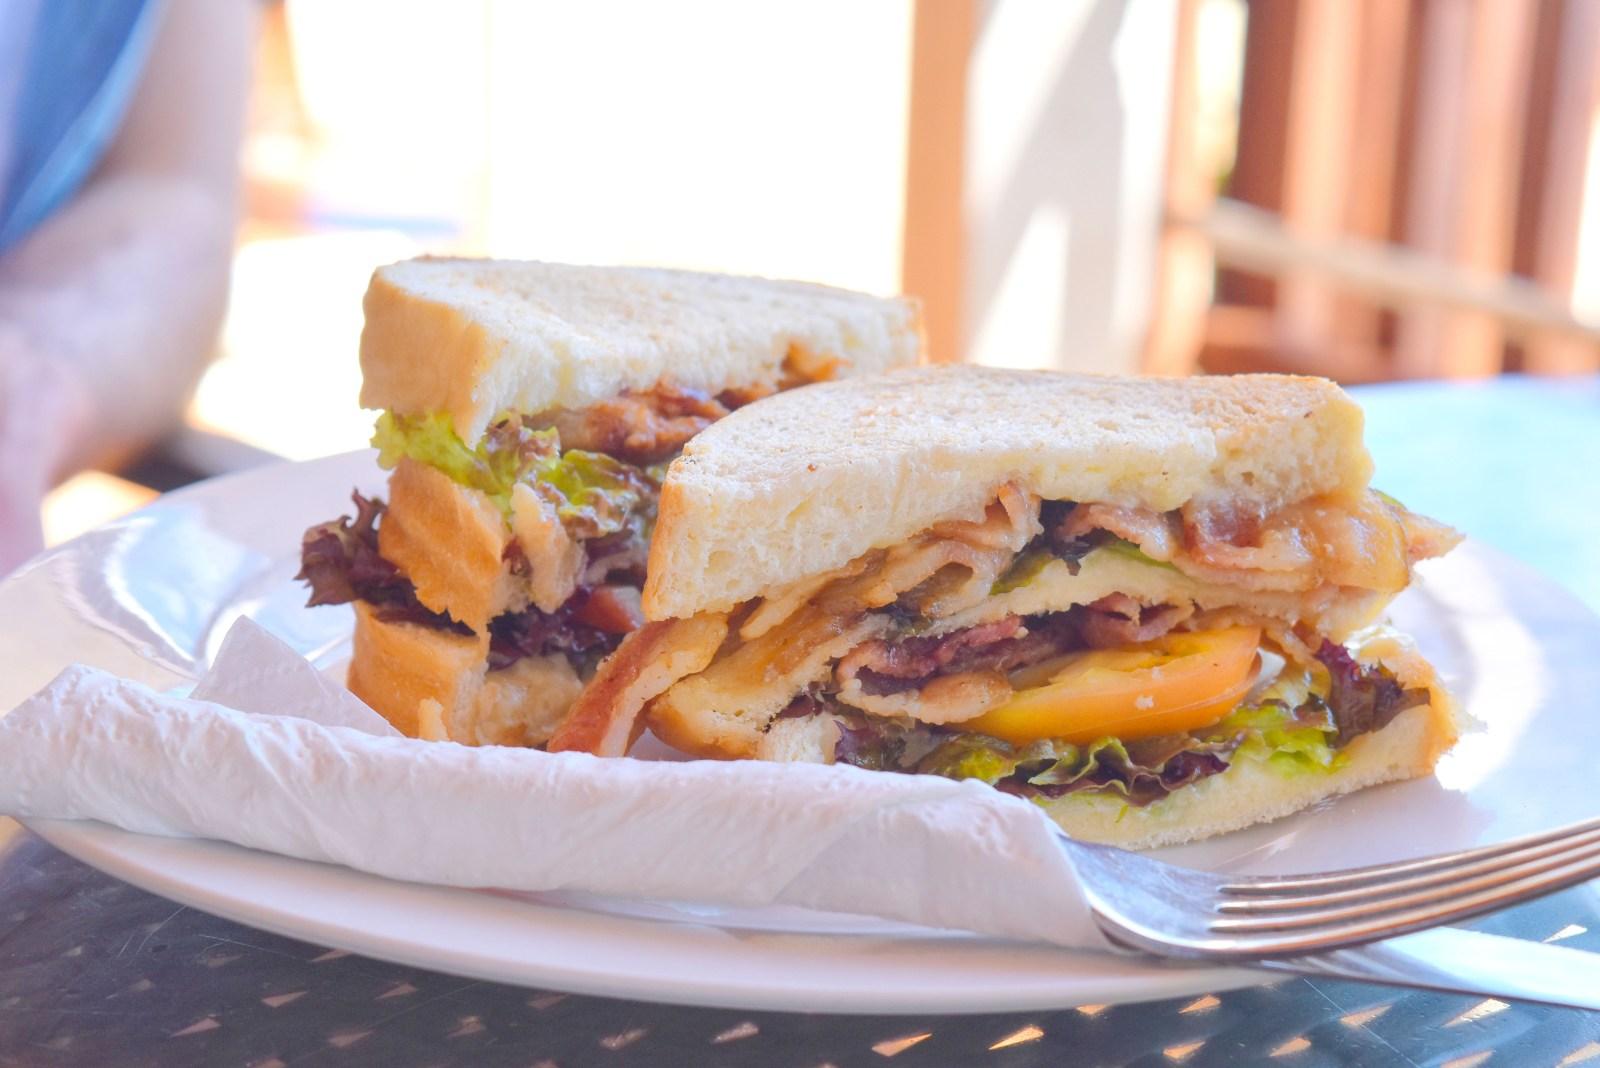 Top Cheap Eats in Nuku'alofa